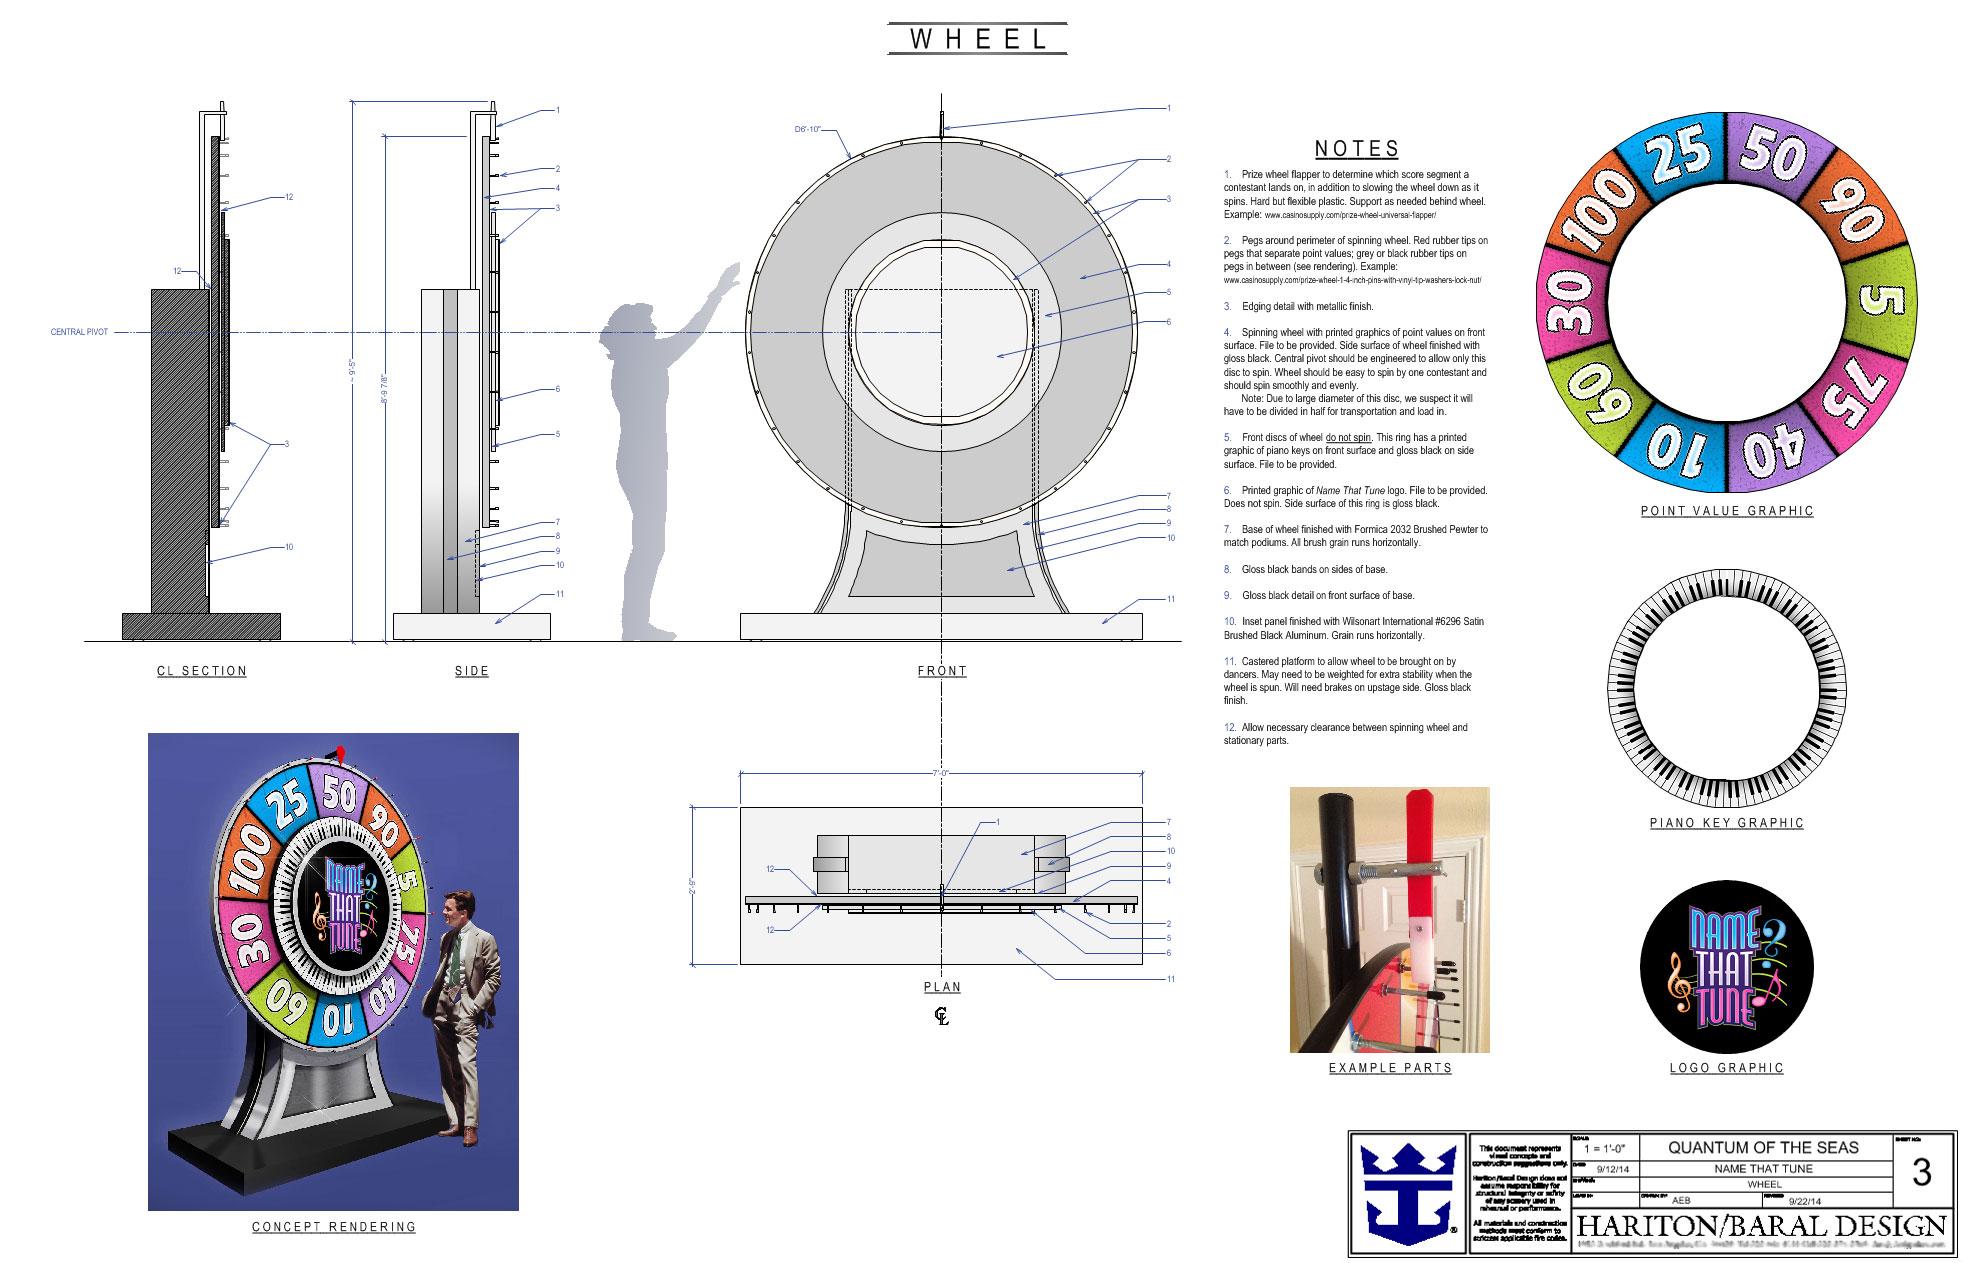 andybroomell-name-that-tune-drafting-wheel.jpg